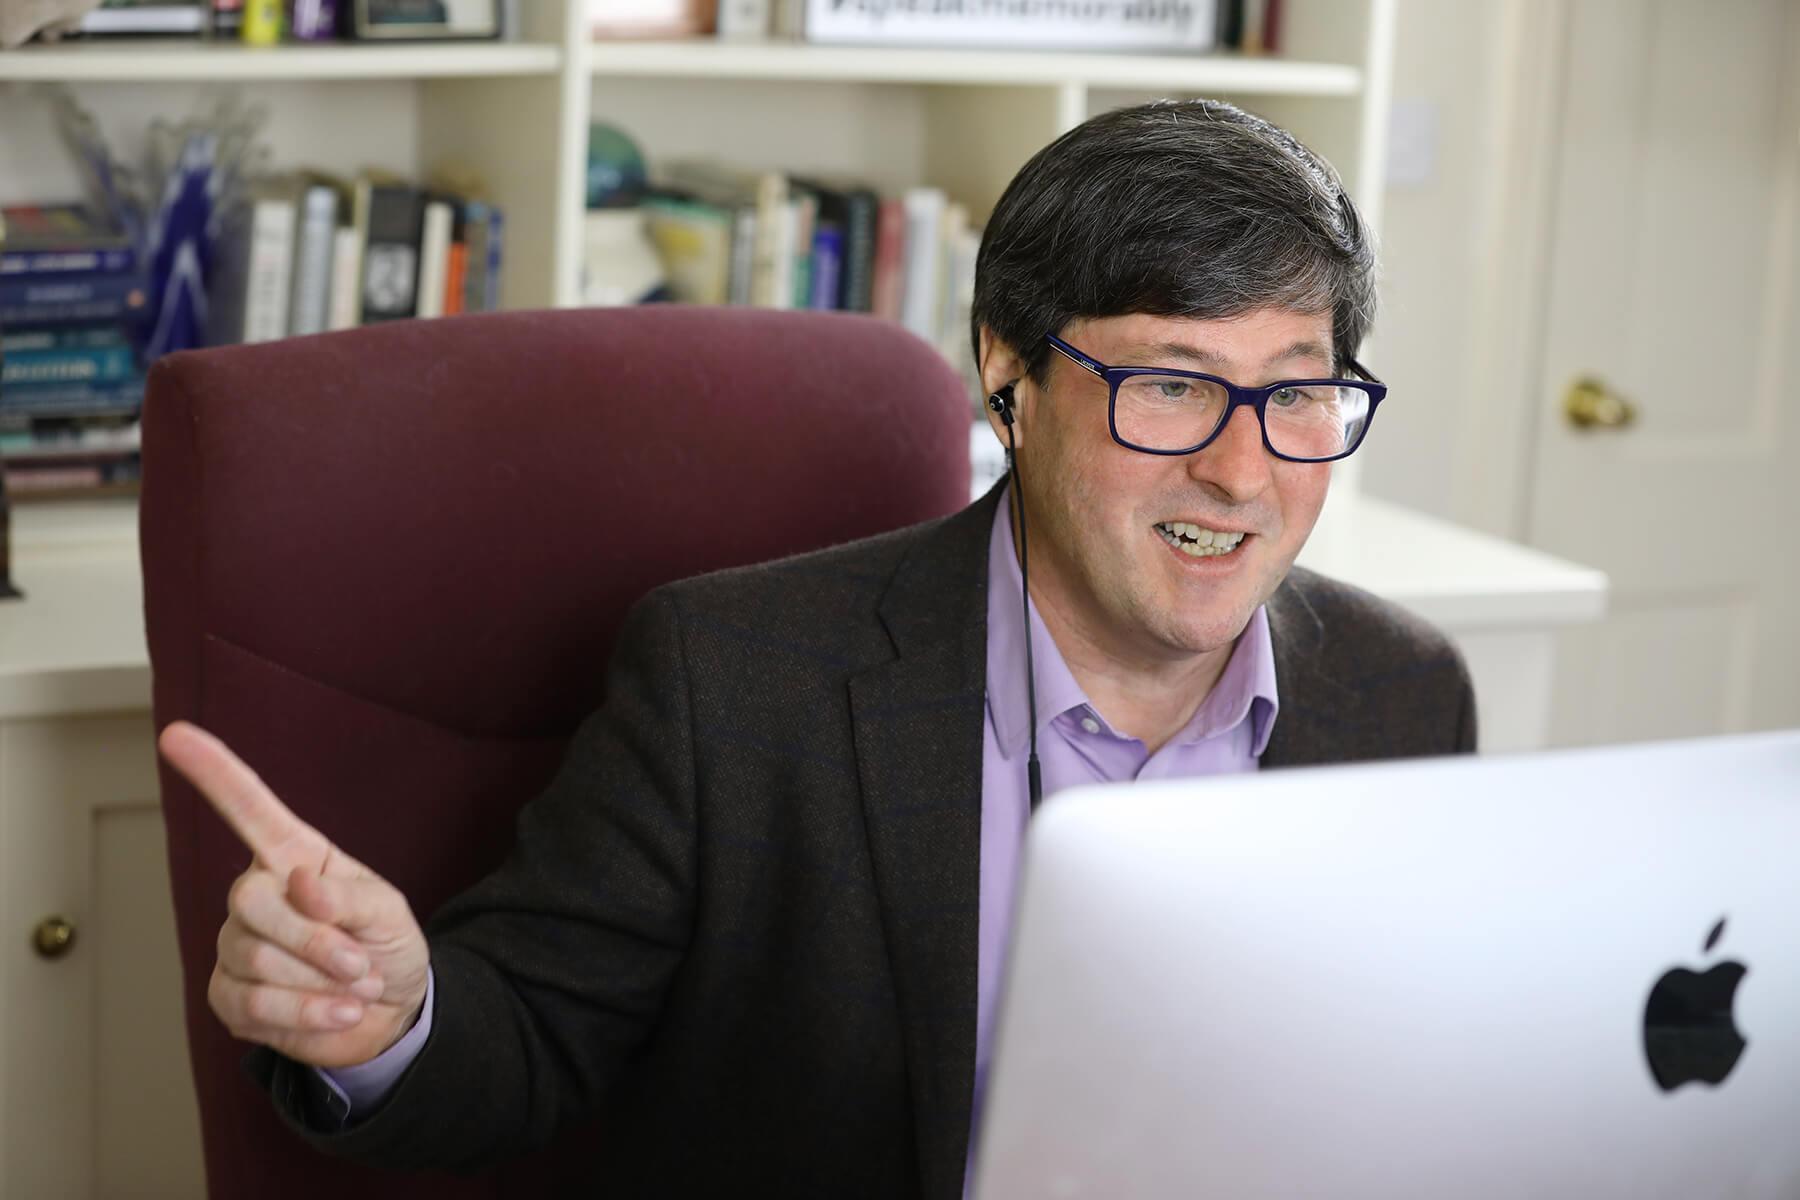 Eamonn O'Brien - Master the art of public speaking